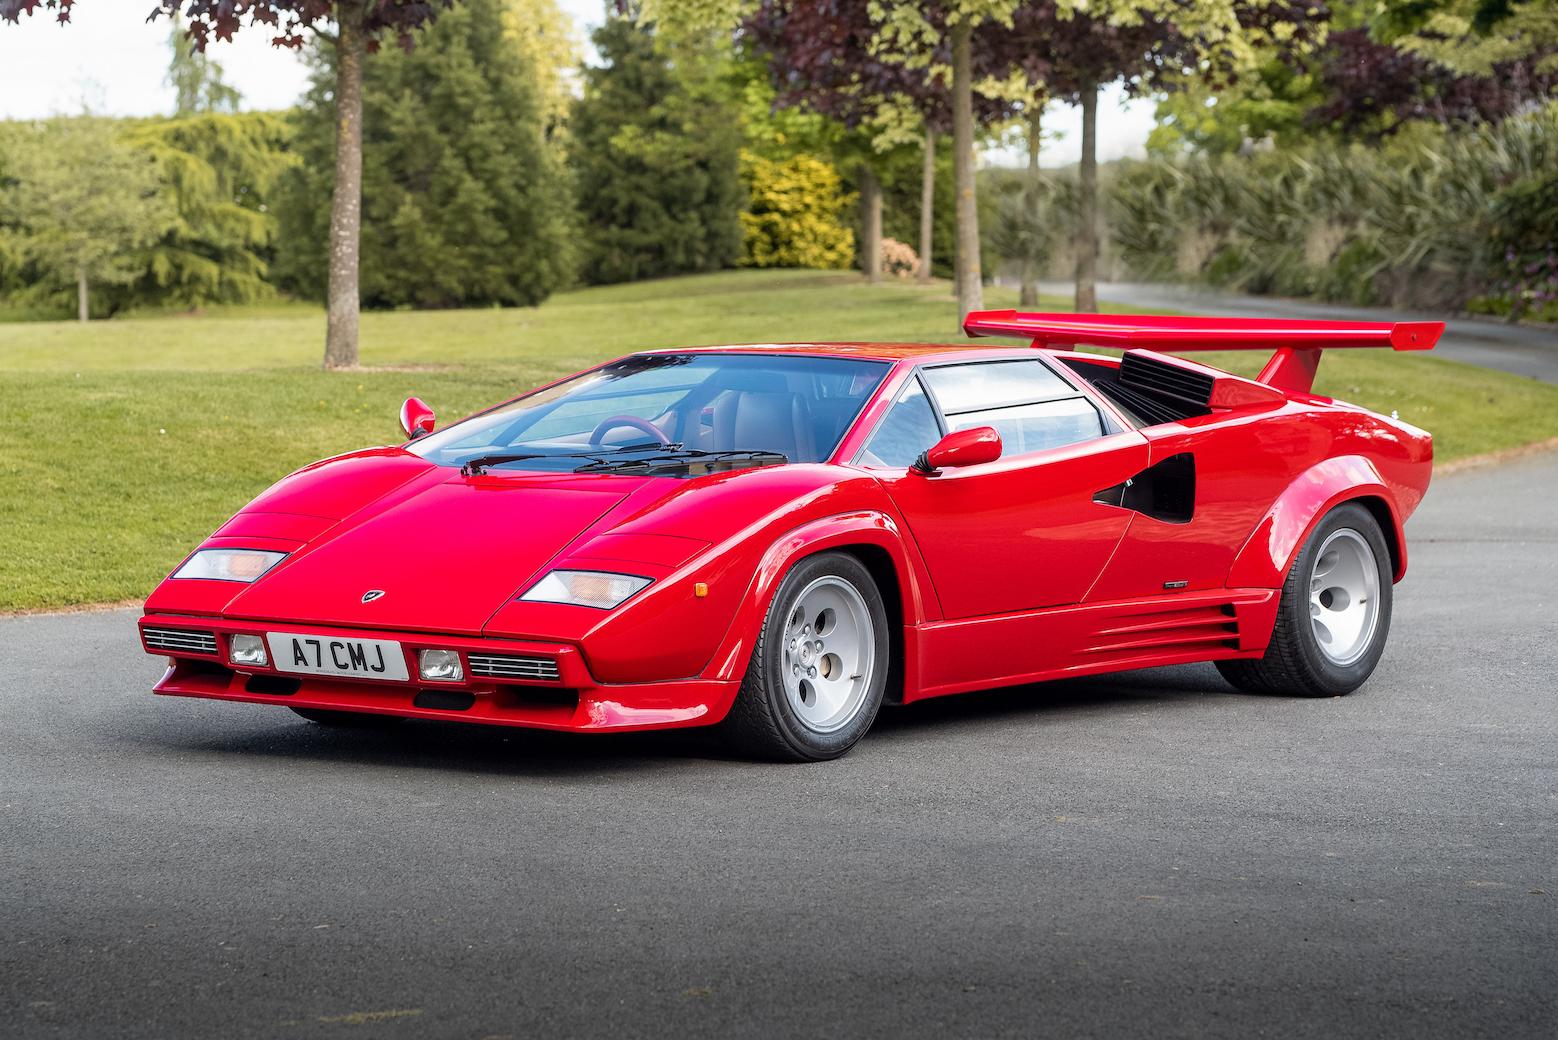 Lamborghini Countach LP5000 QV – Red version MOC-57851 Technic Designed By Rastacoco With 1316 Pieces